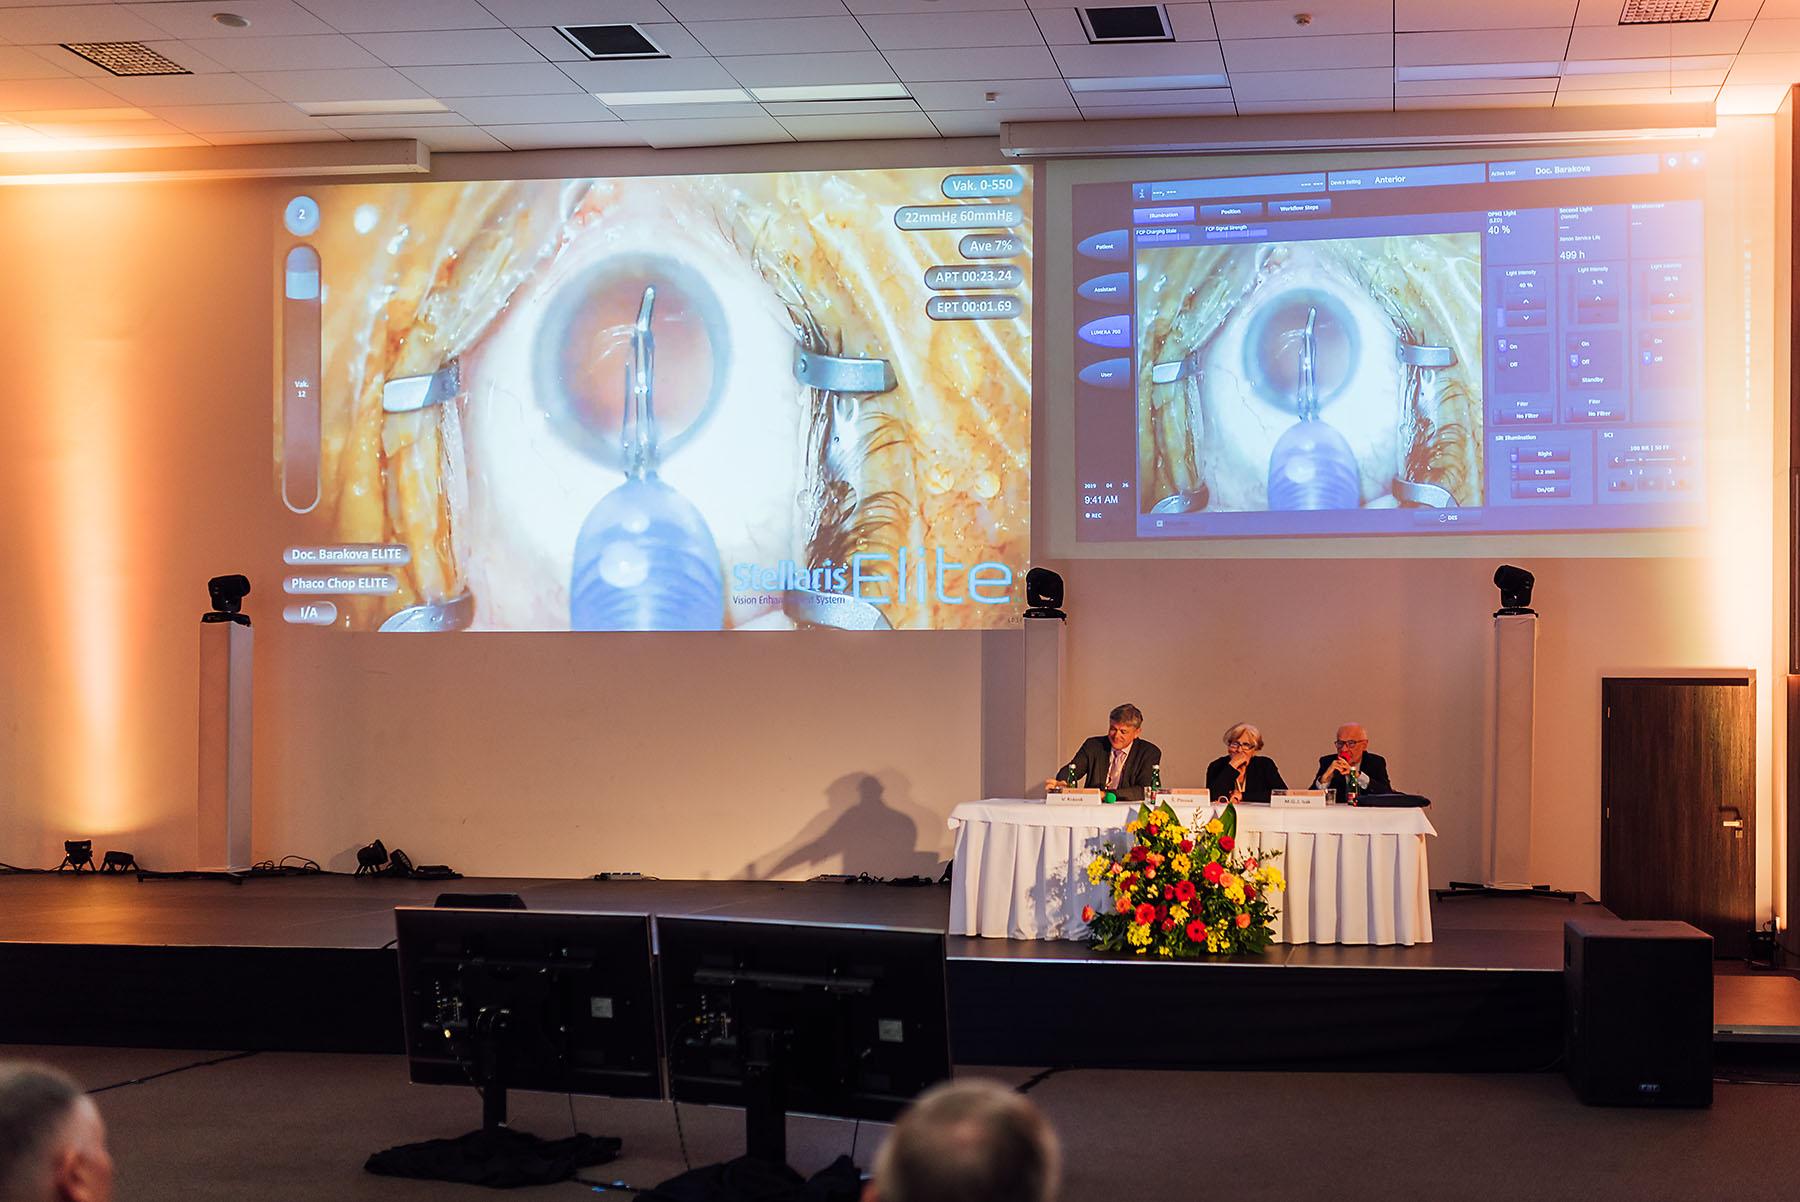 X.Bilaterálne Česko-Slovenské Oftalmologické Sympózium 2019 - x-bionic, sympózium, medicína, lekárska komora, kongres, konferencia - eventovy fotograf